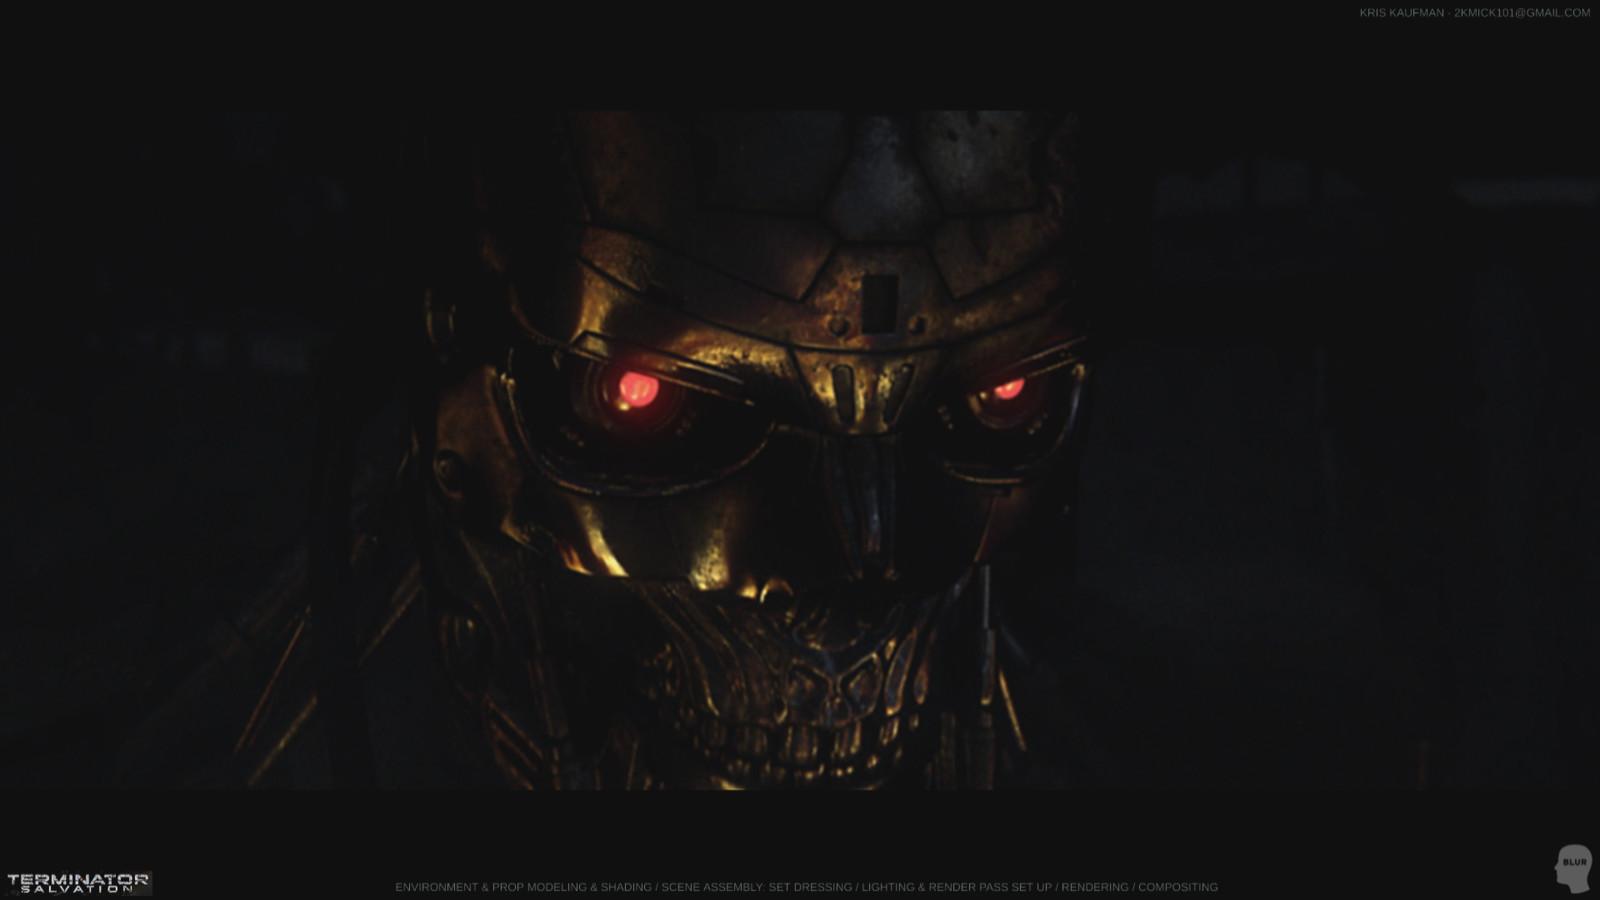 Terminator Salvation: Lighting / Rendering / Compositing